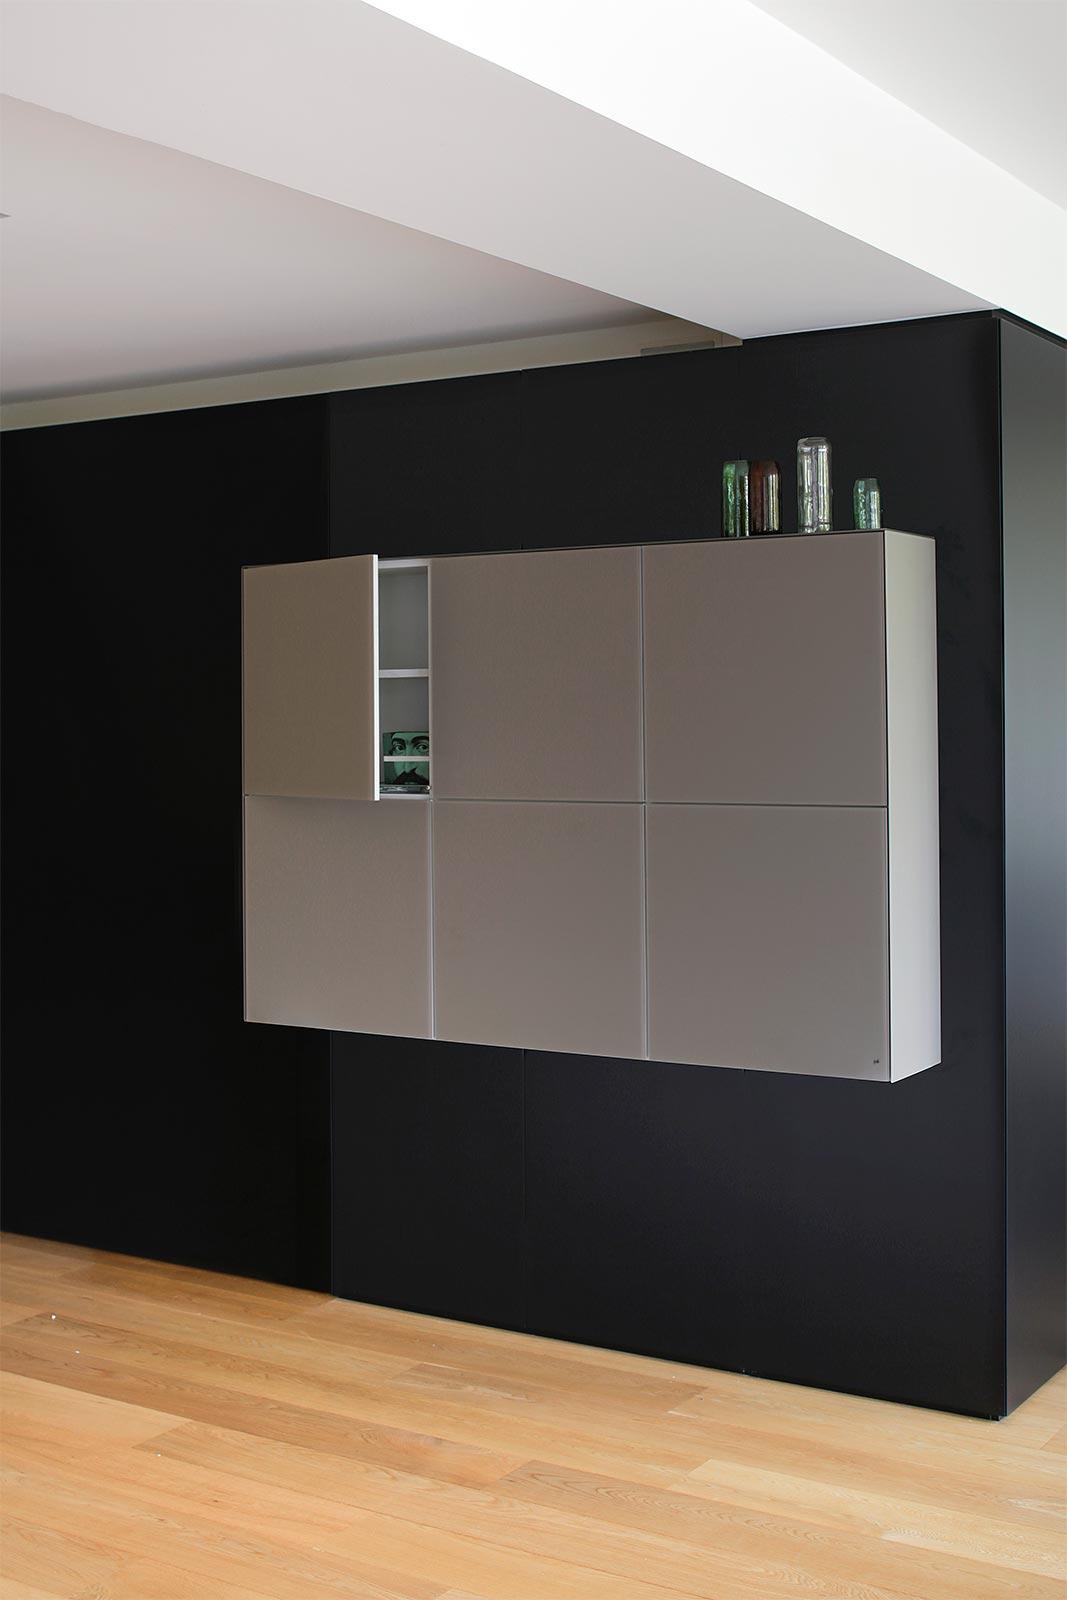 armoire cube 55 noorden design. Black Bedroom Furniture Sets. Home Design Ideas